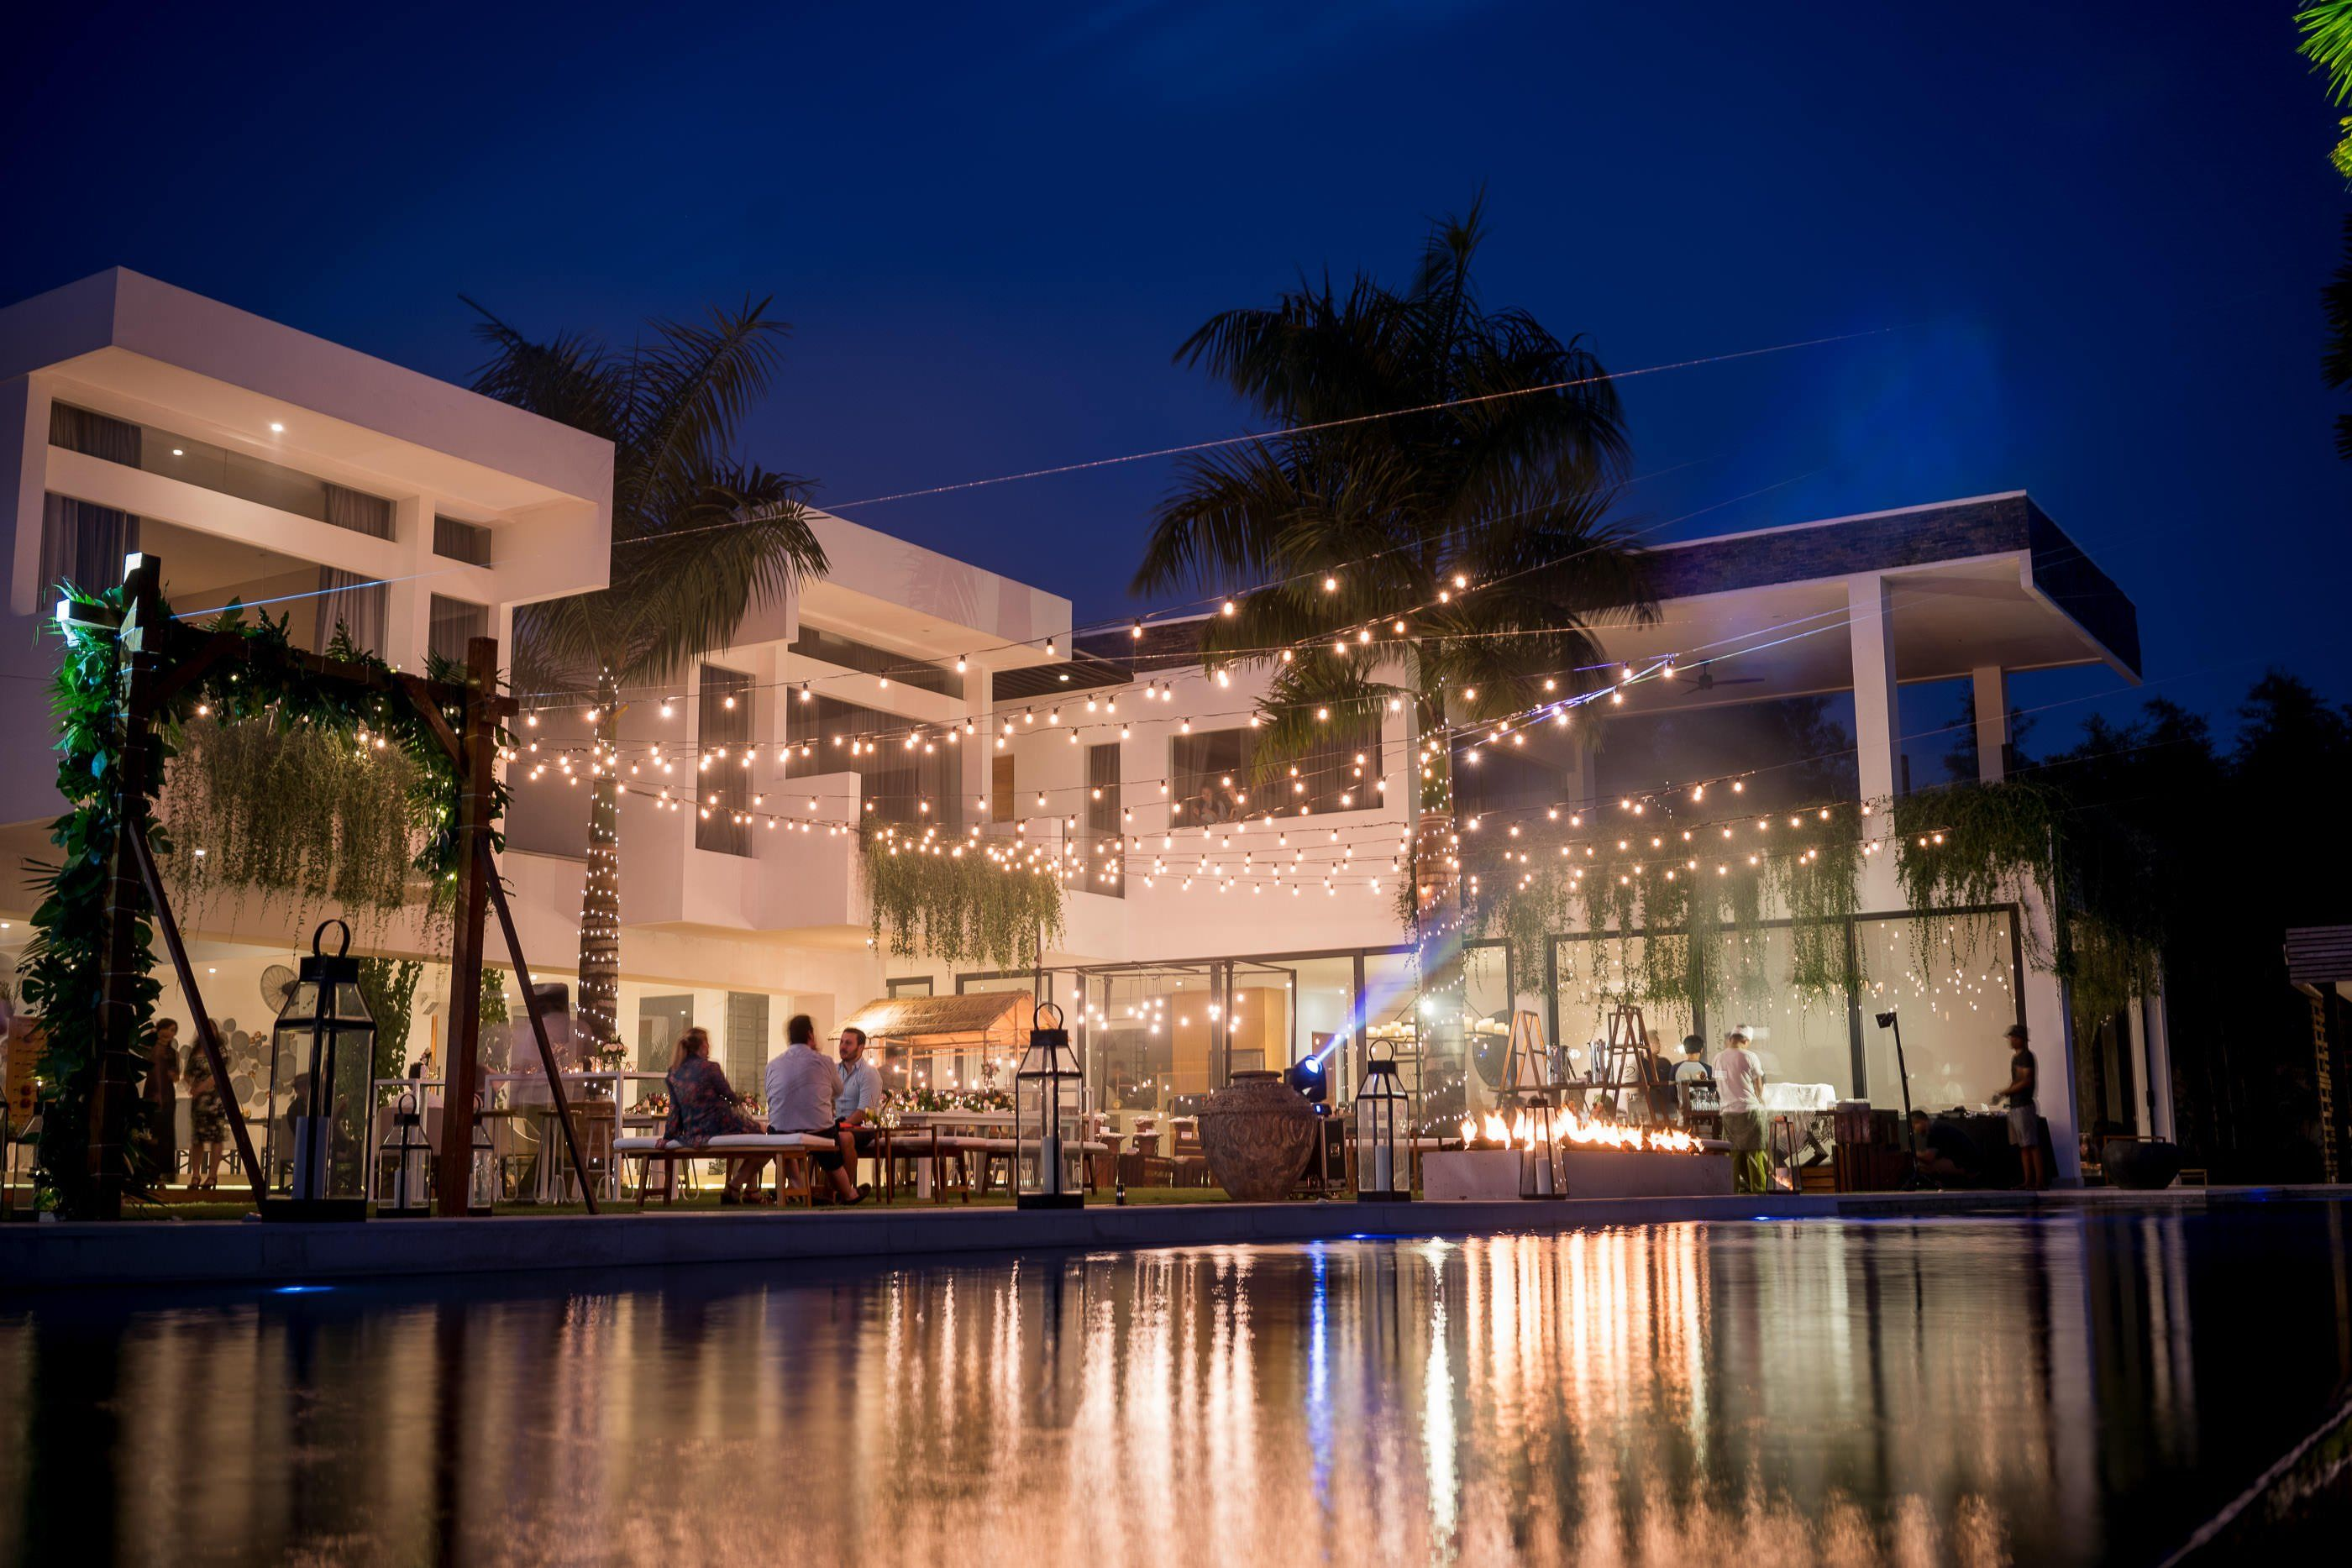 destination wedding decor styling inspiration